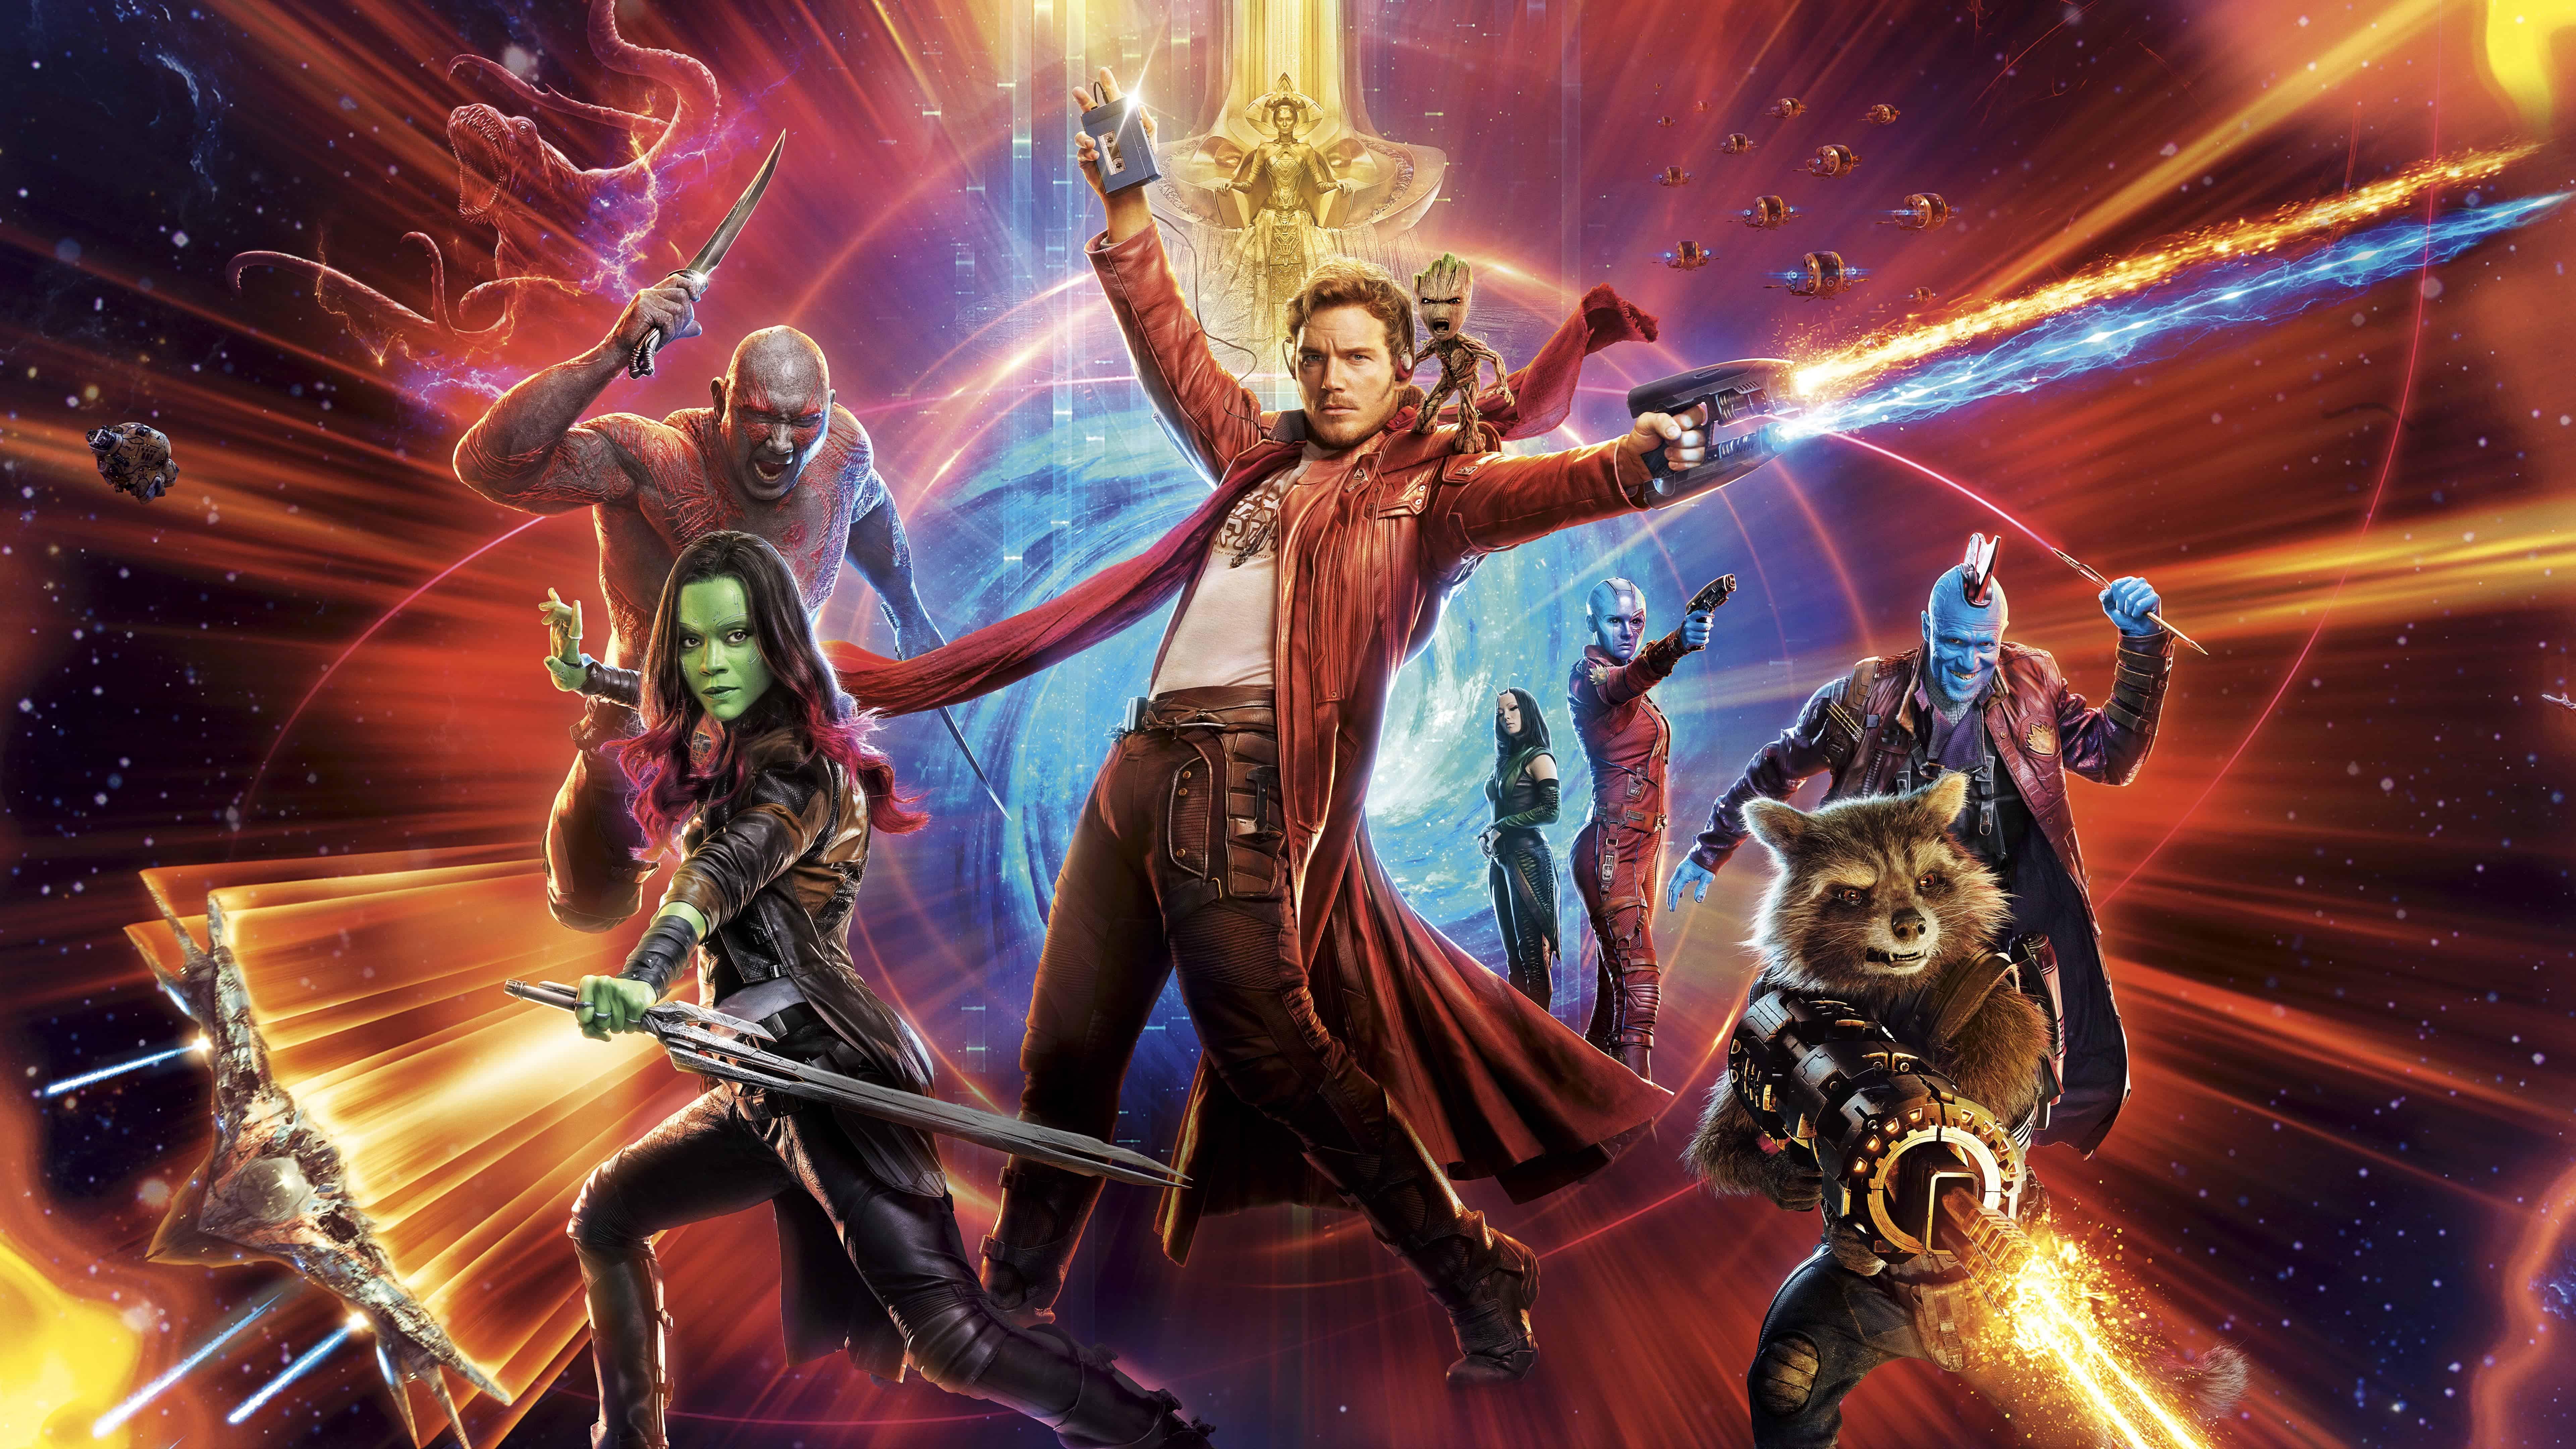 Guardians of the galaxy vol 2 movie uhd 8k wallpaper pixelz - Guardians of the galaxy 2 8k ...